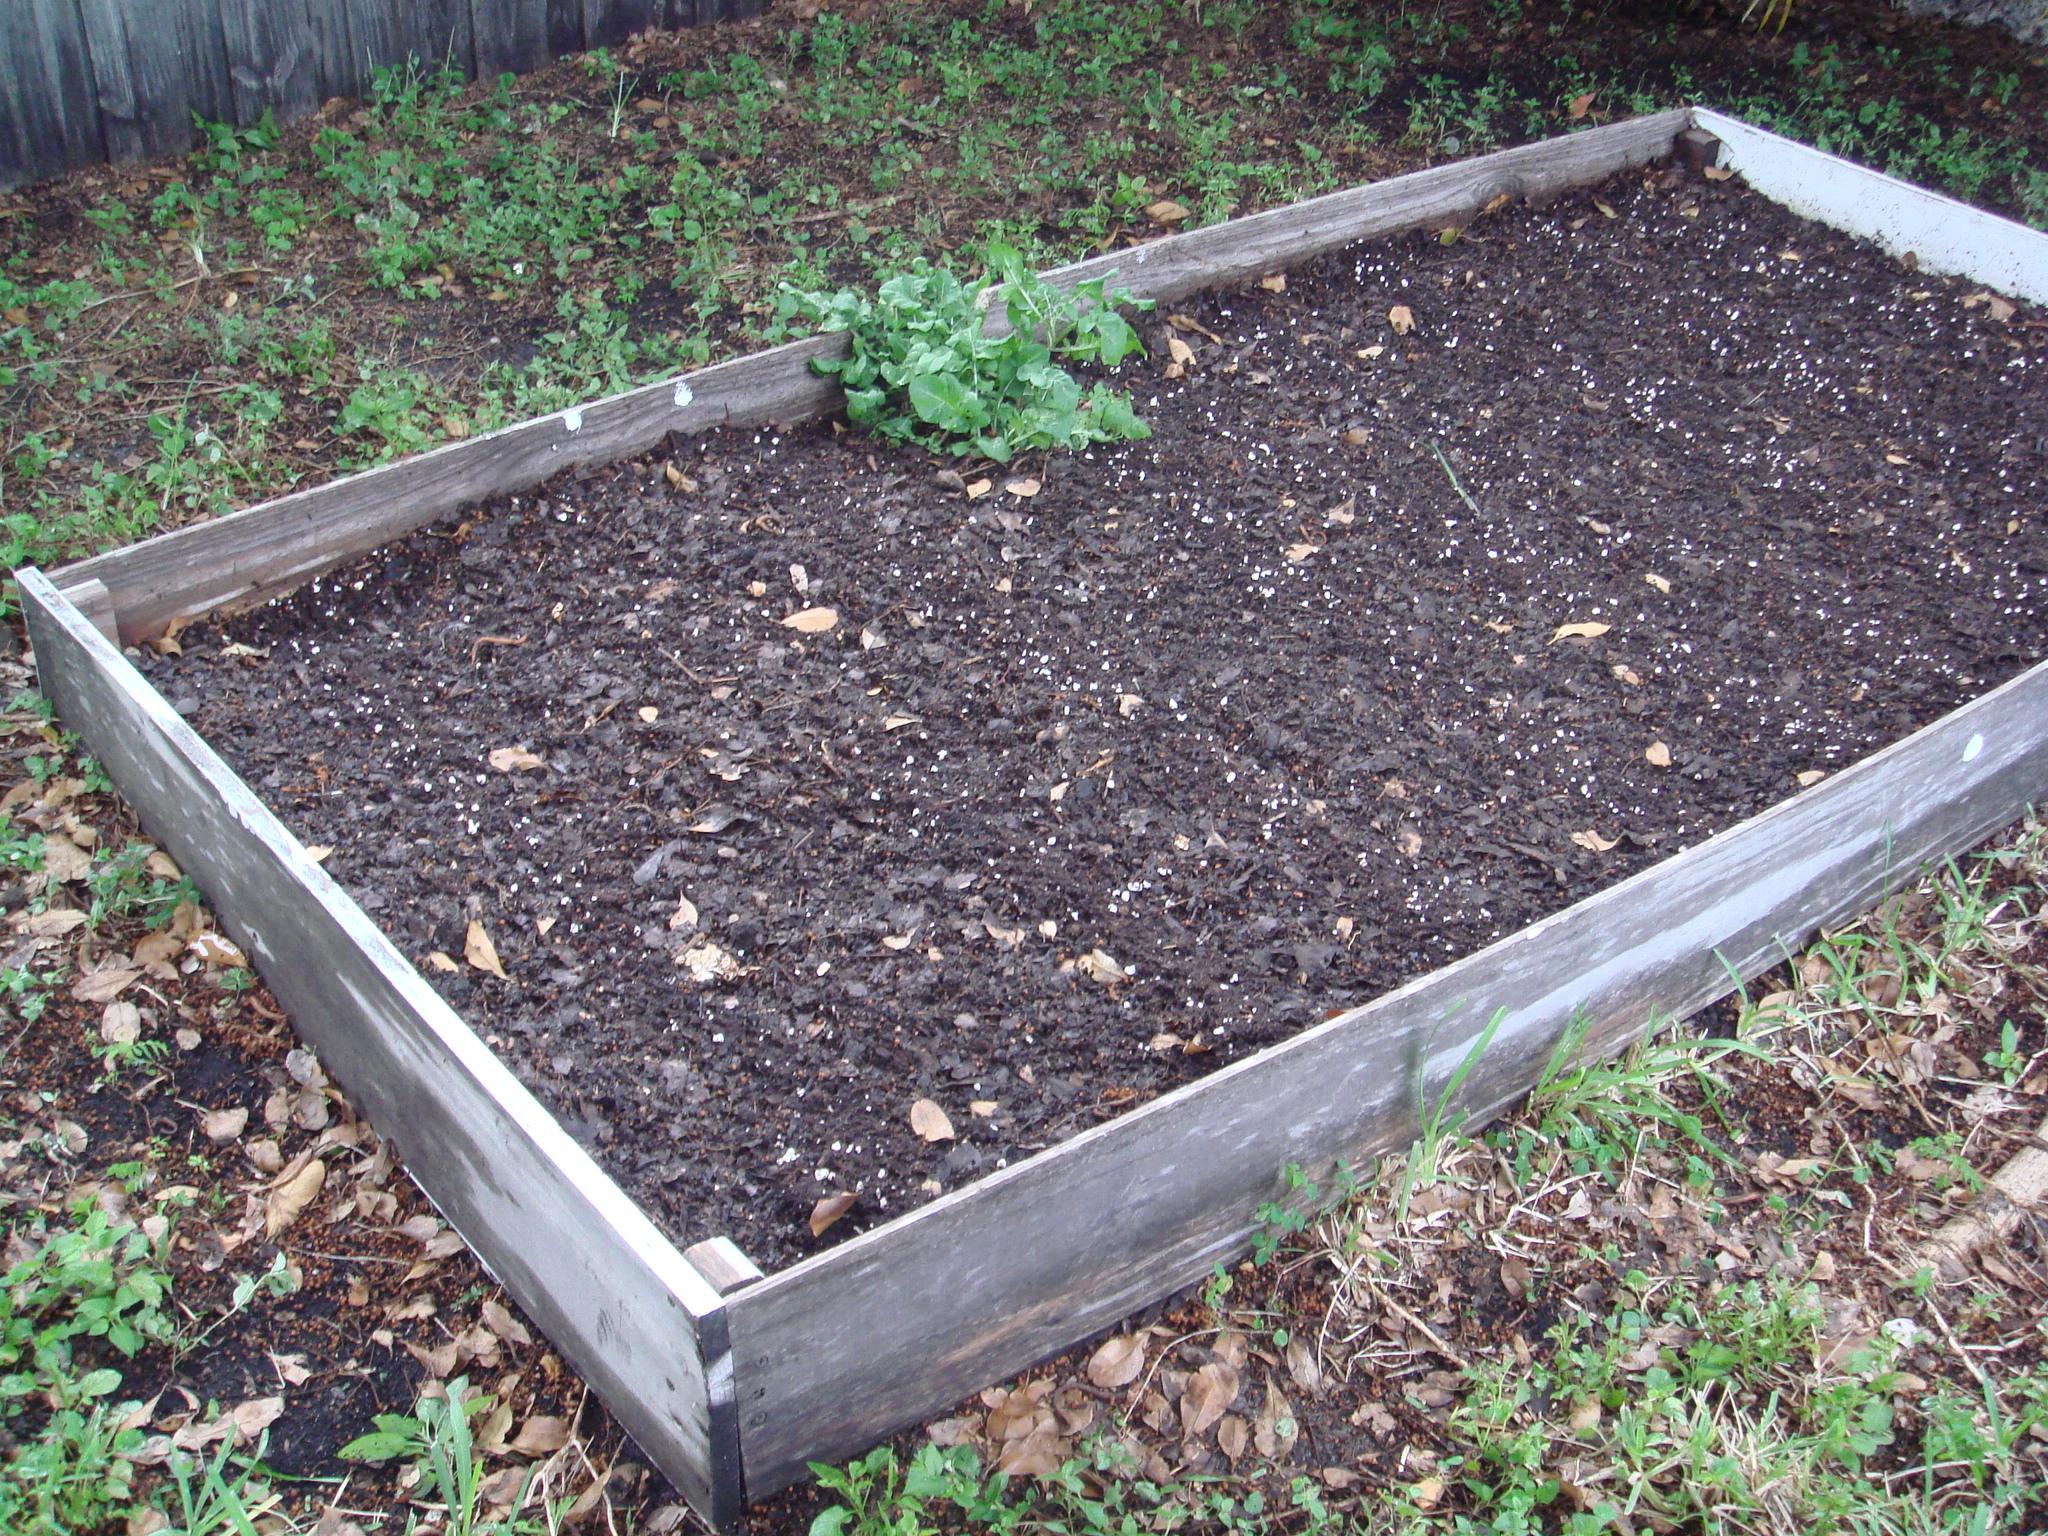 Raised Bed Garden Soil Planting In Raised Bed Garden Image Titled Prepare A Raised Bed Garden